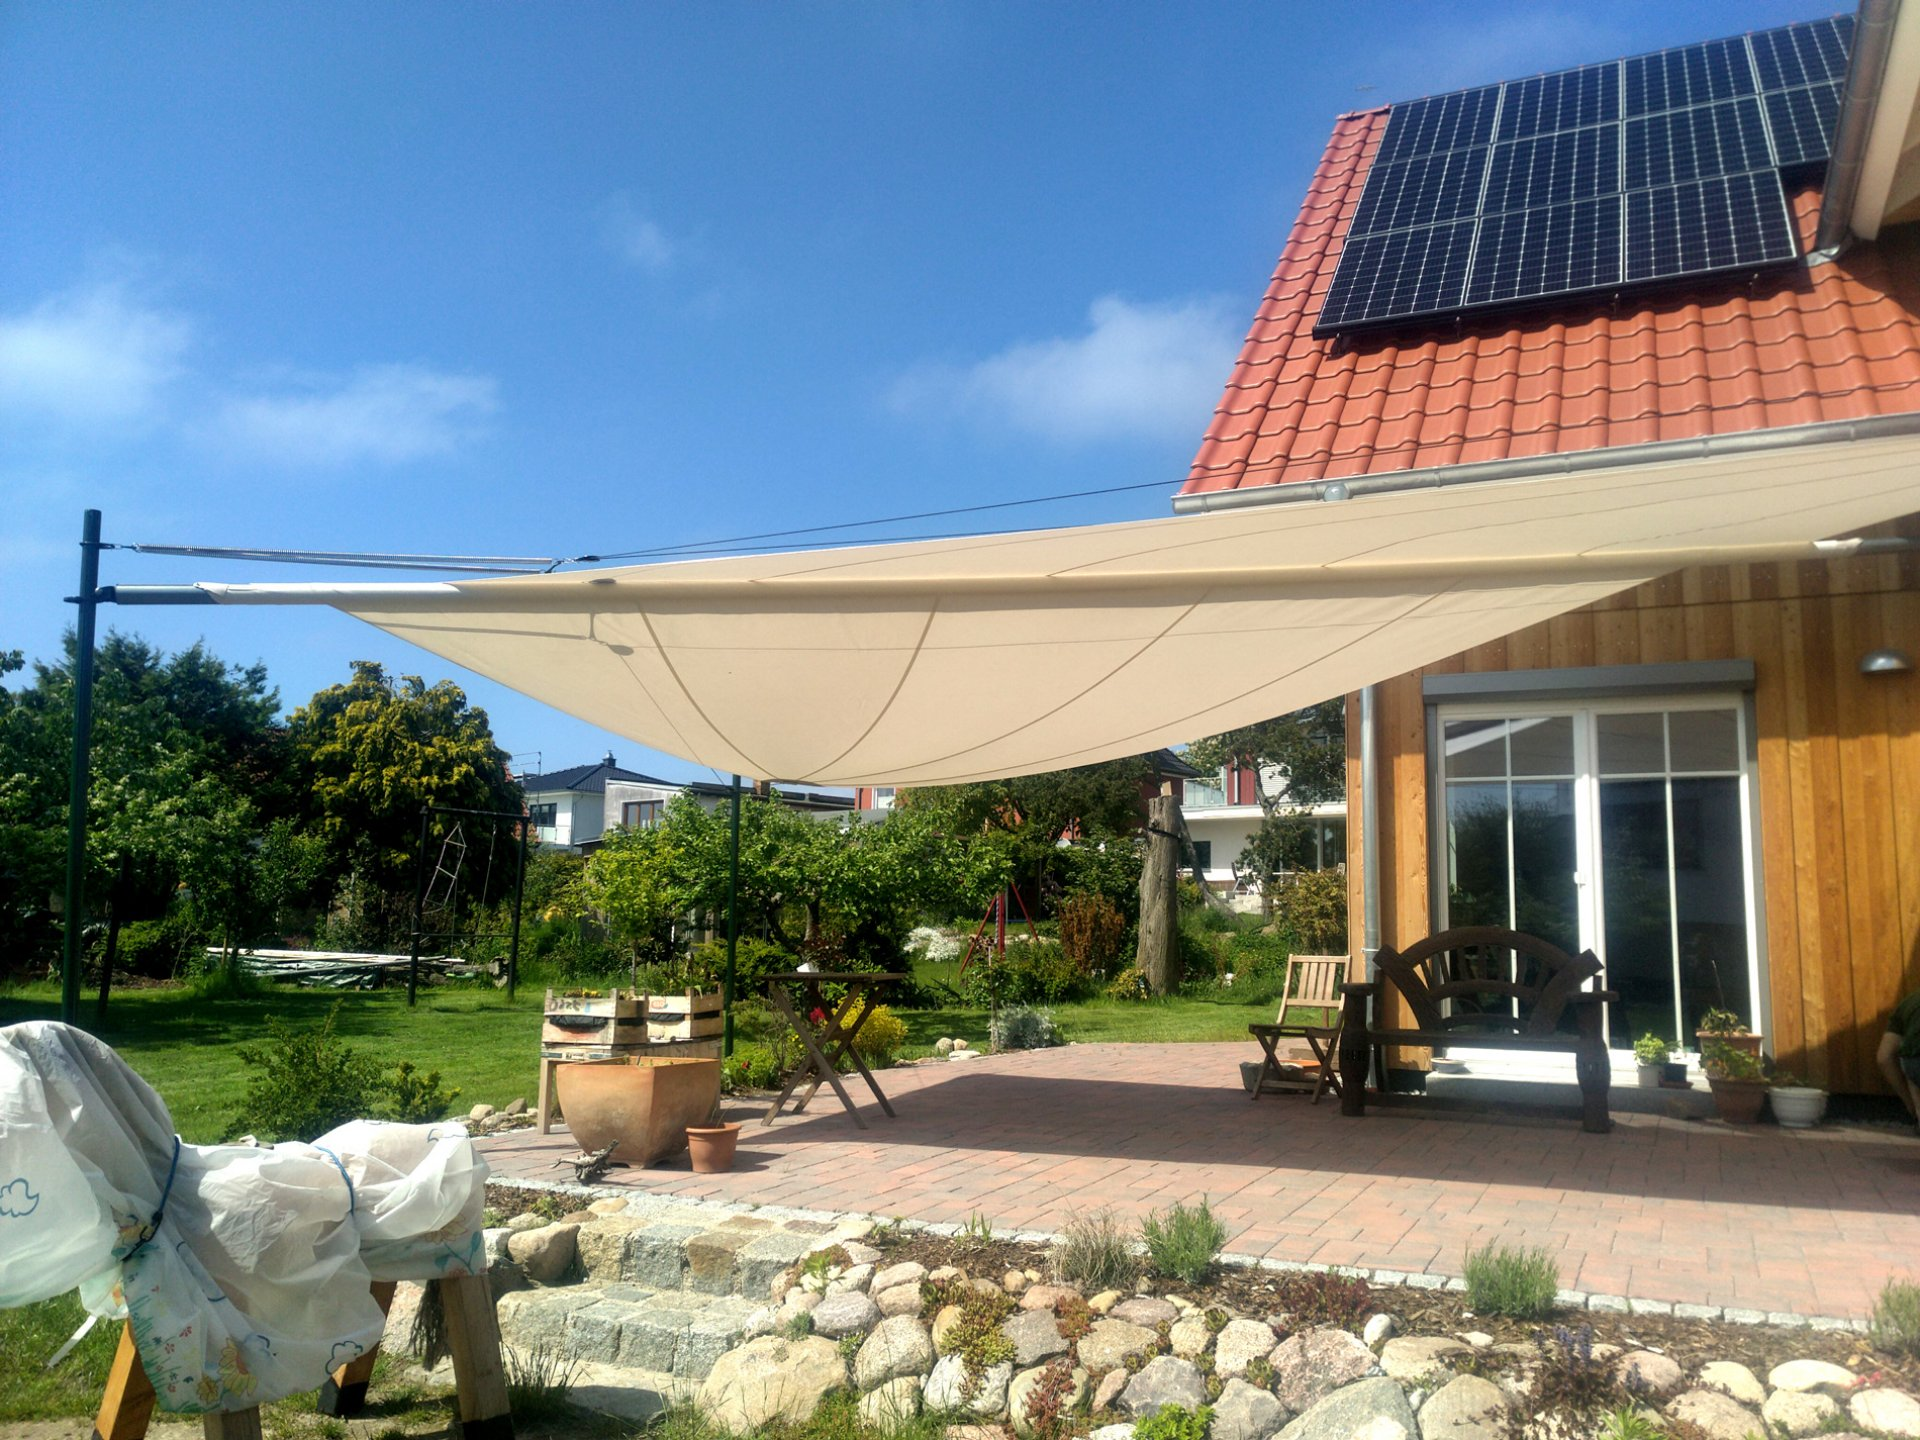 SunSquare Sonnensegel - Vertriebspartner Unter Segeln 54 Grad Nord